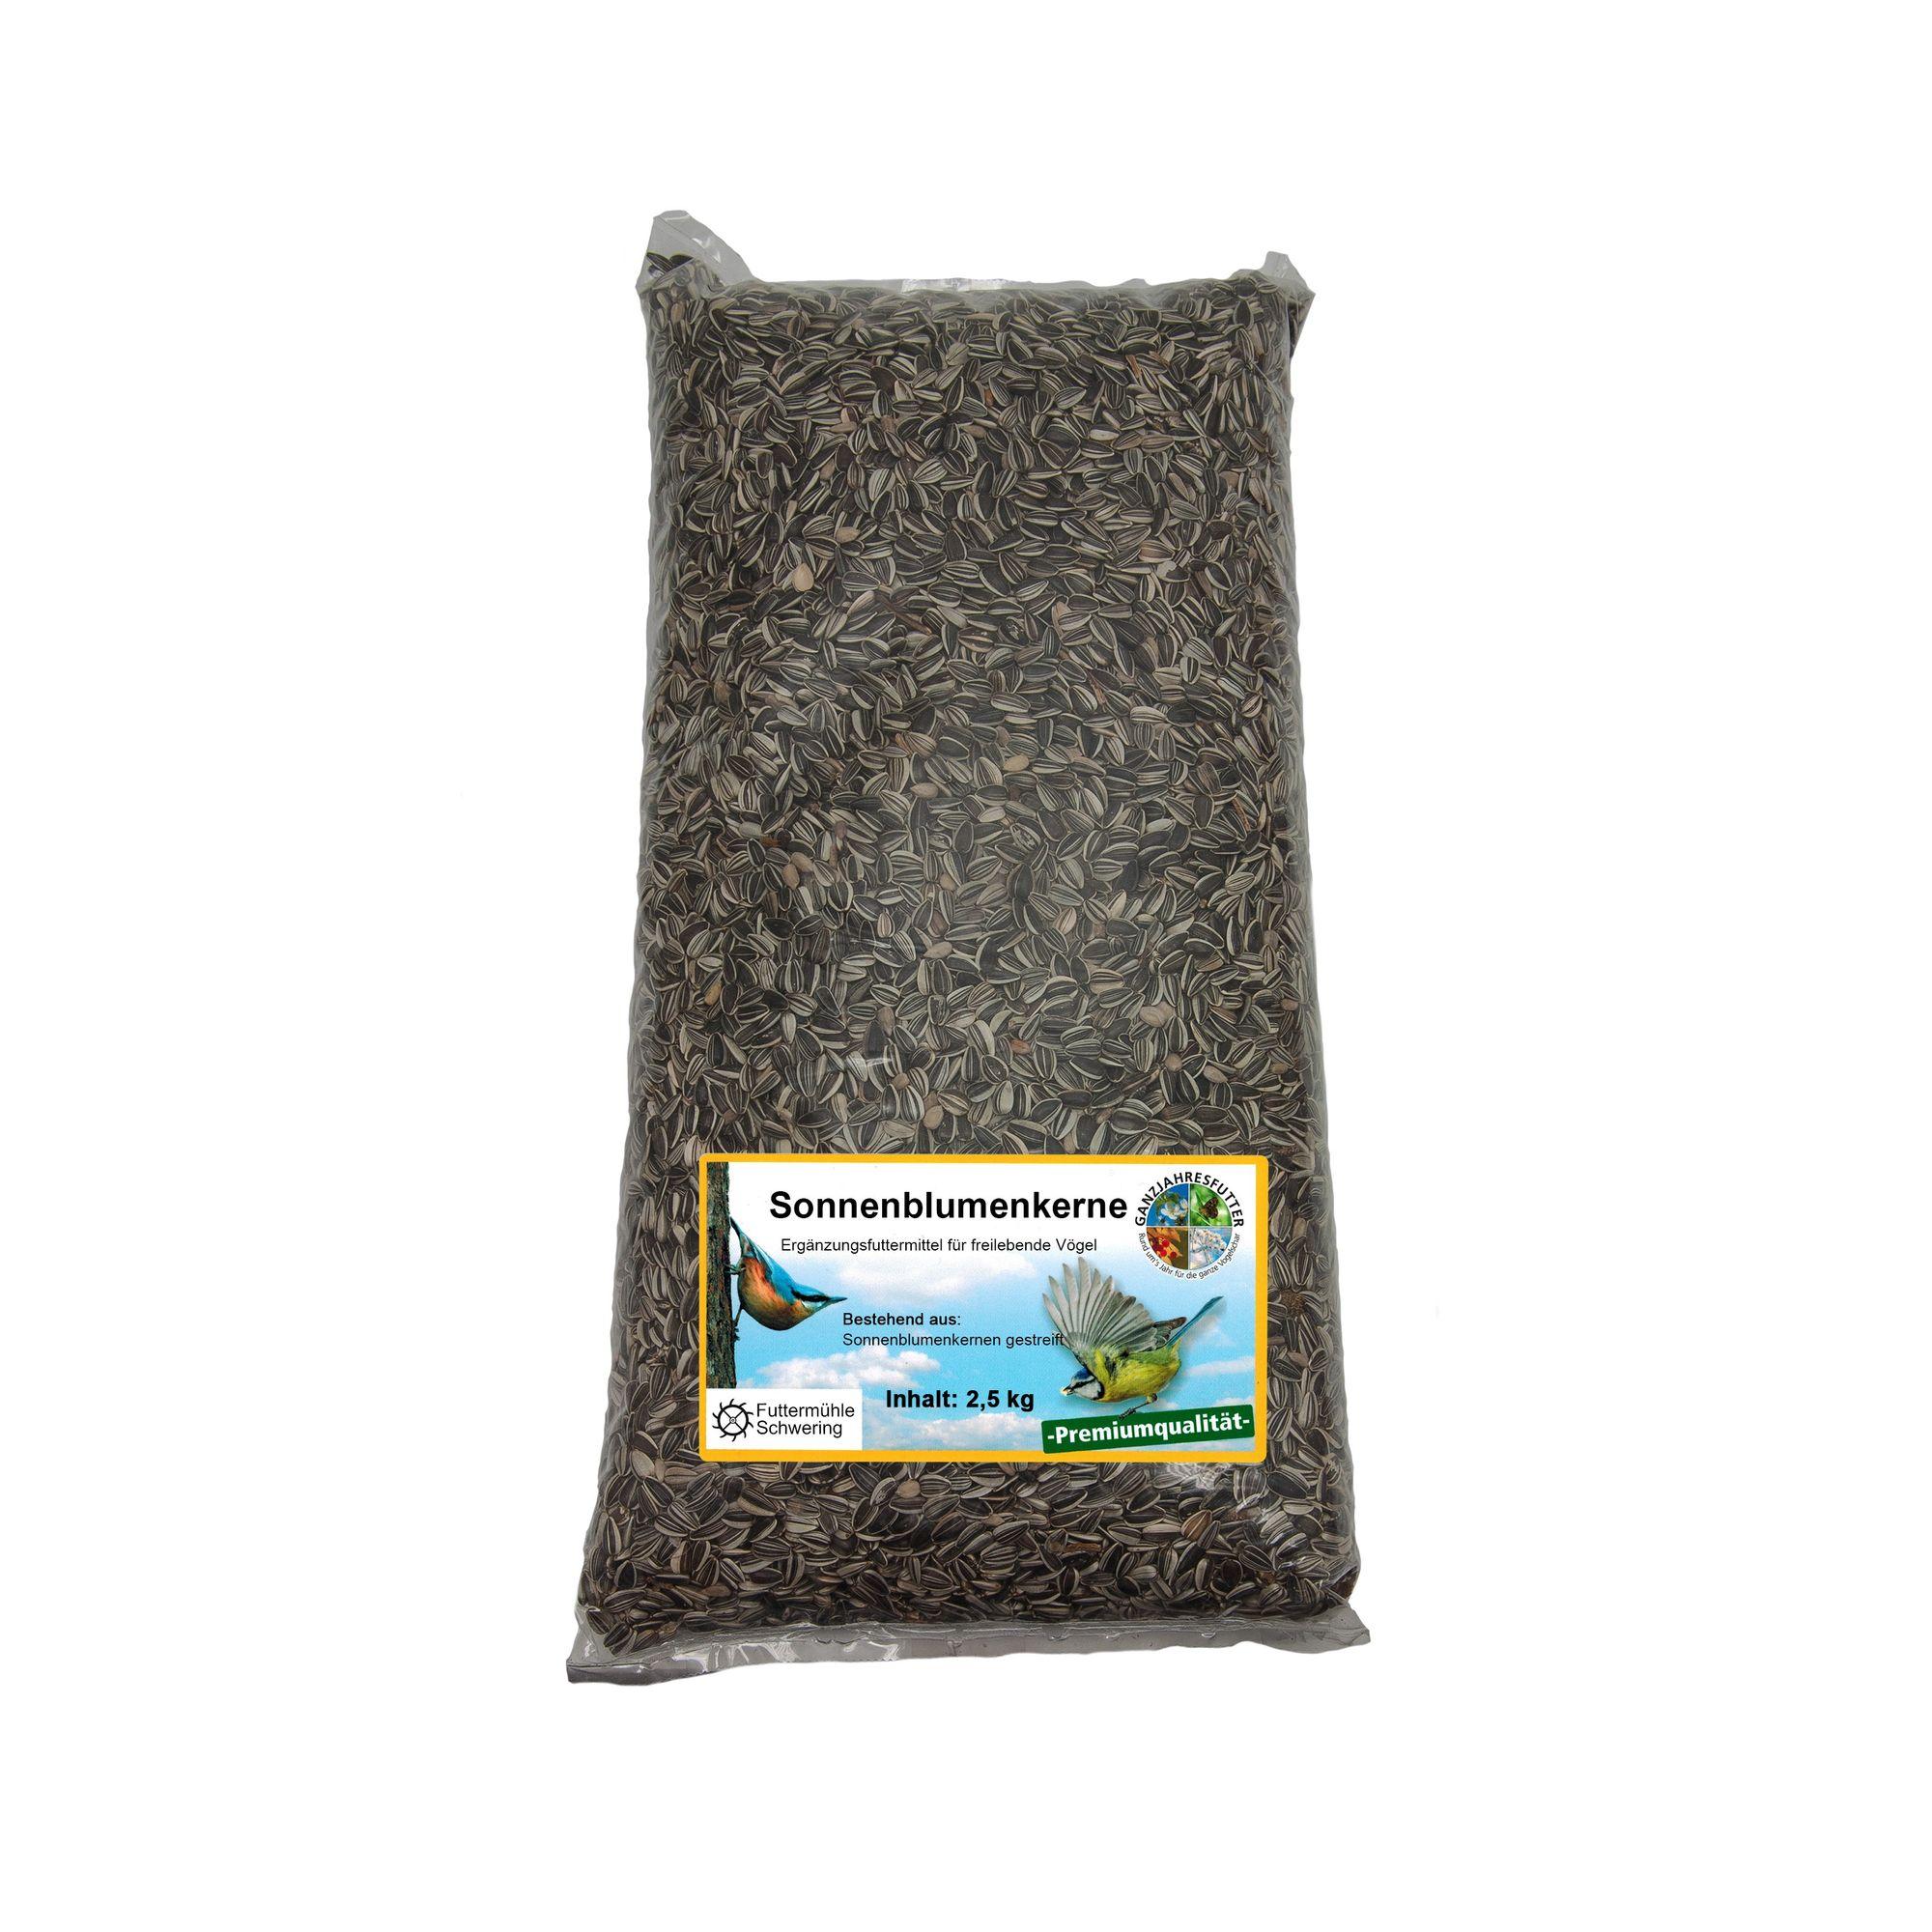 Sonnenblumenkerne, gestreift, 2,5 kg Btl.